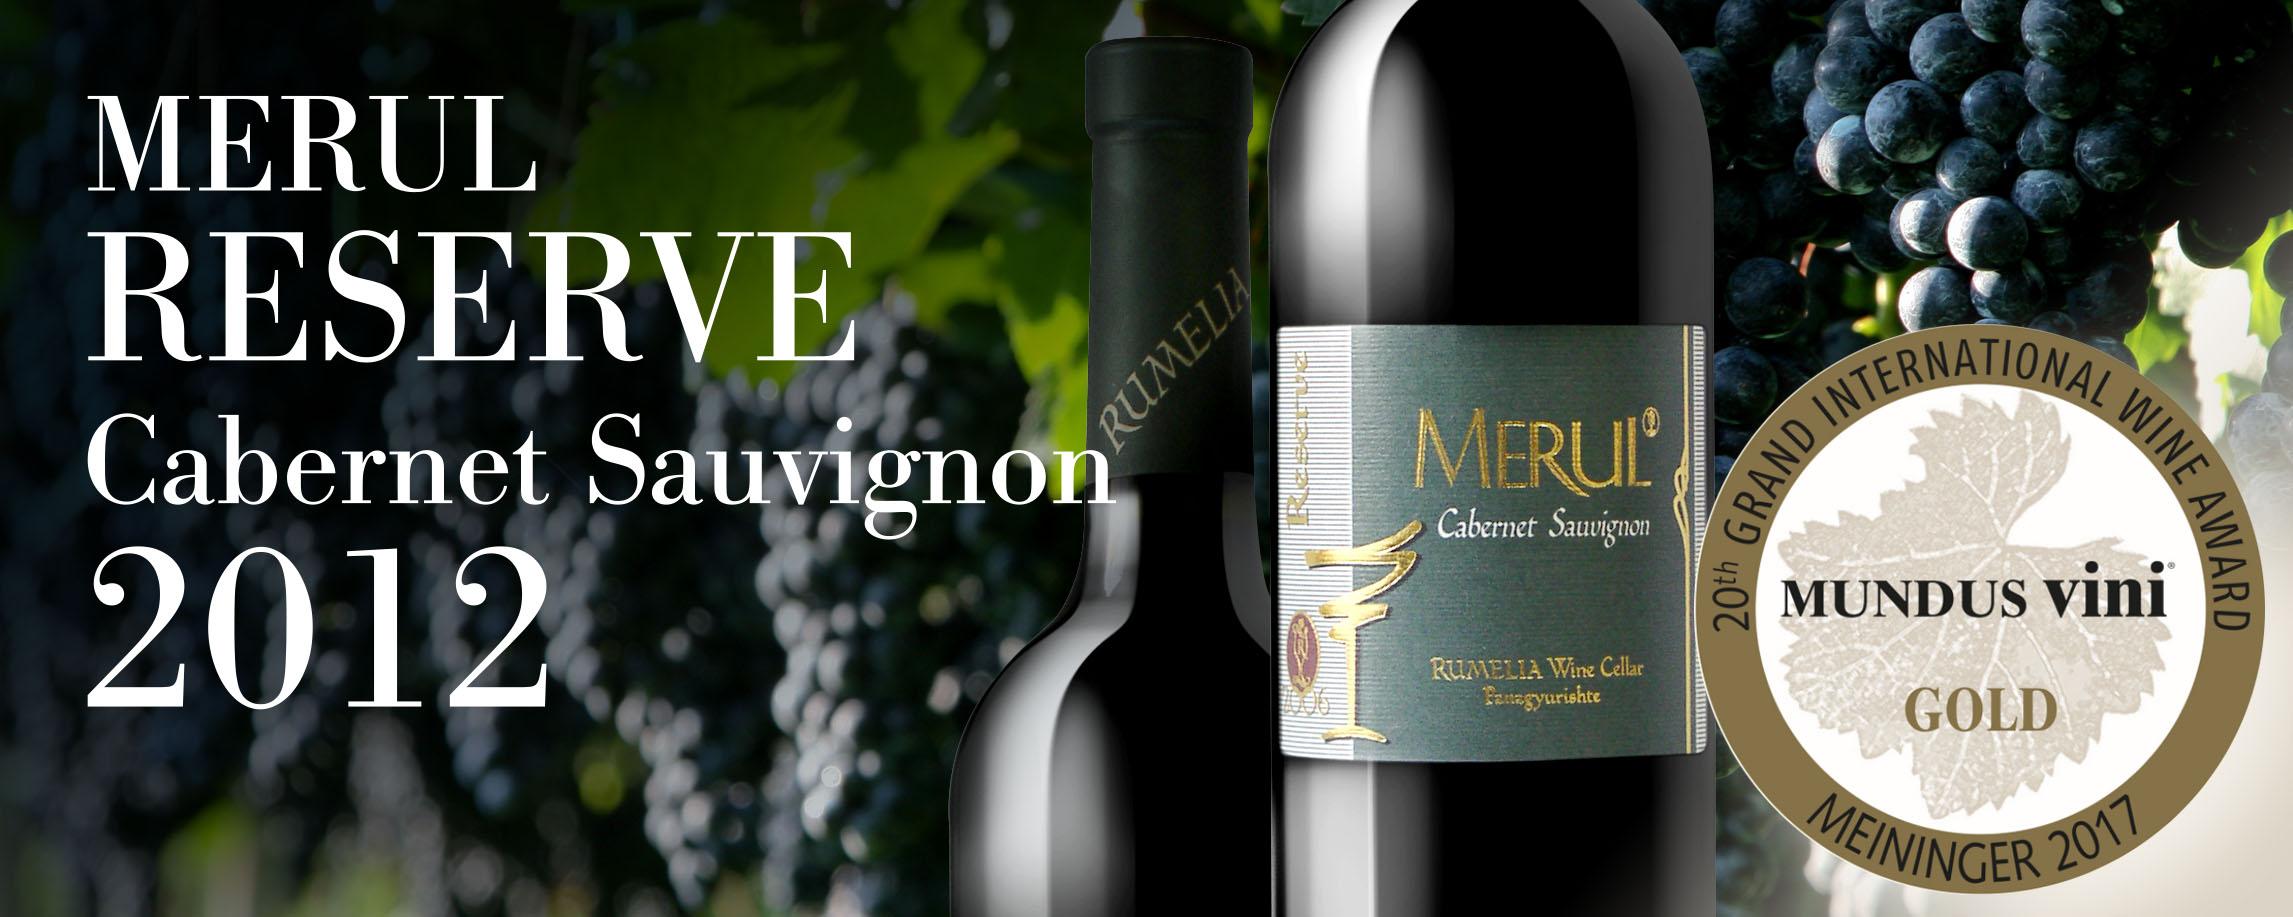 Rumelia_Cabernet-Sauvignon-2012-copy